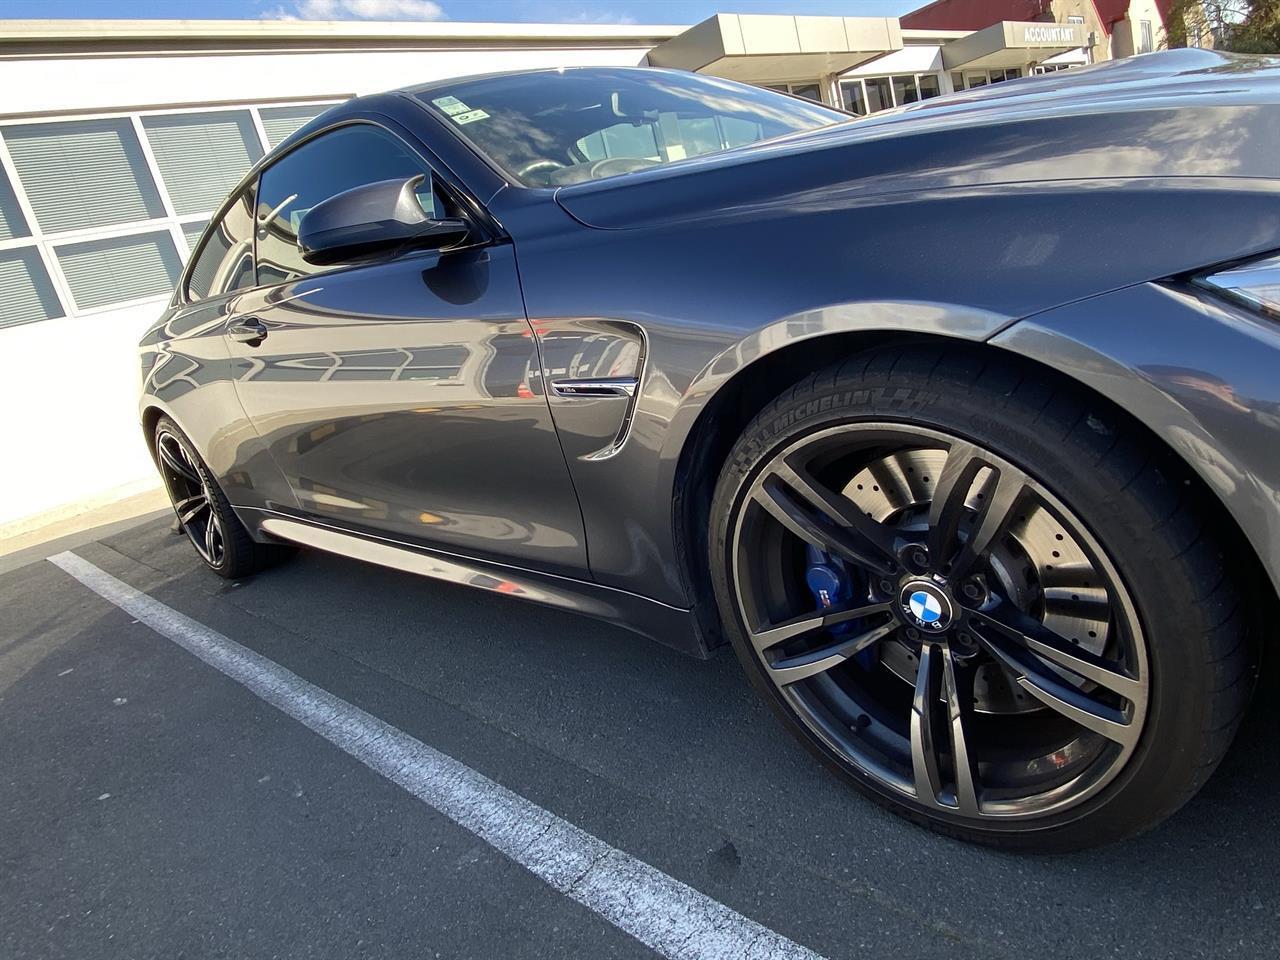 image-4, 2014 BMW M4 at Christchurch